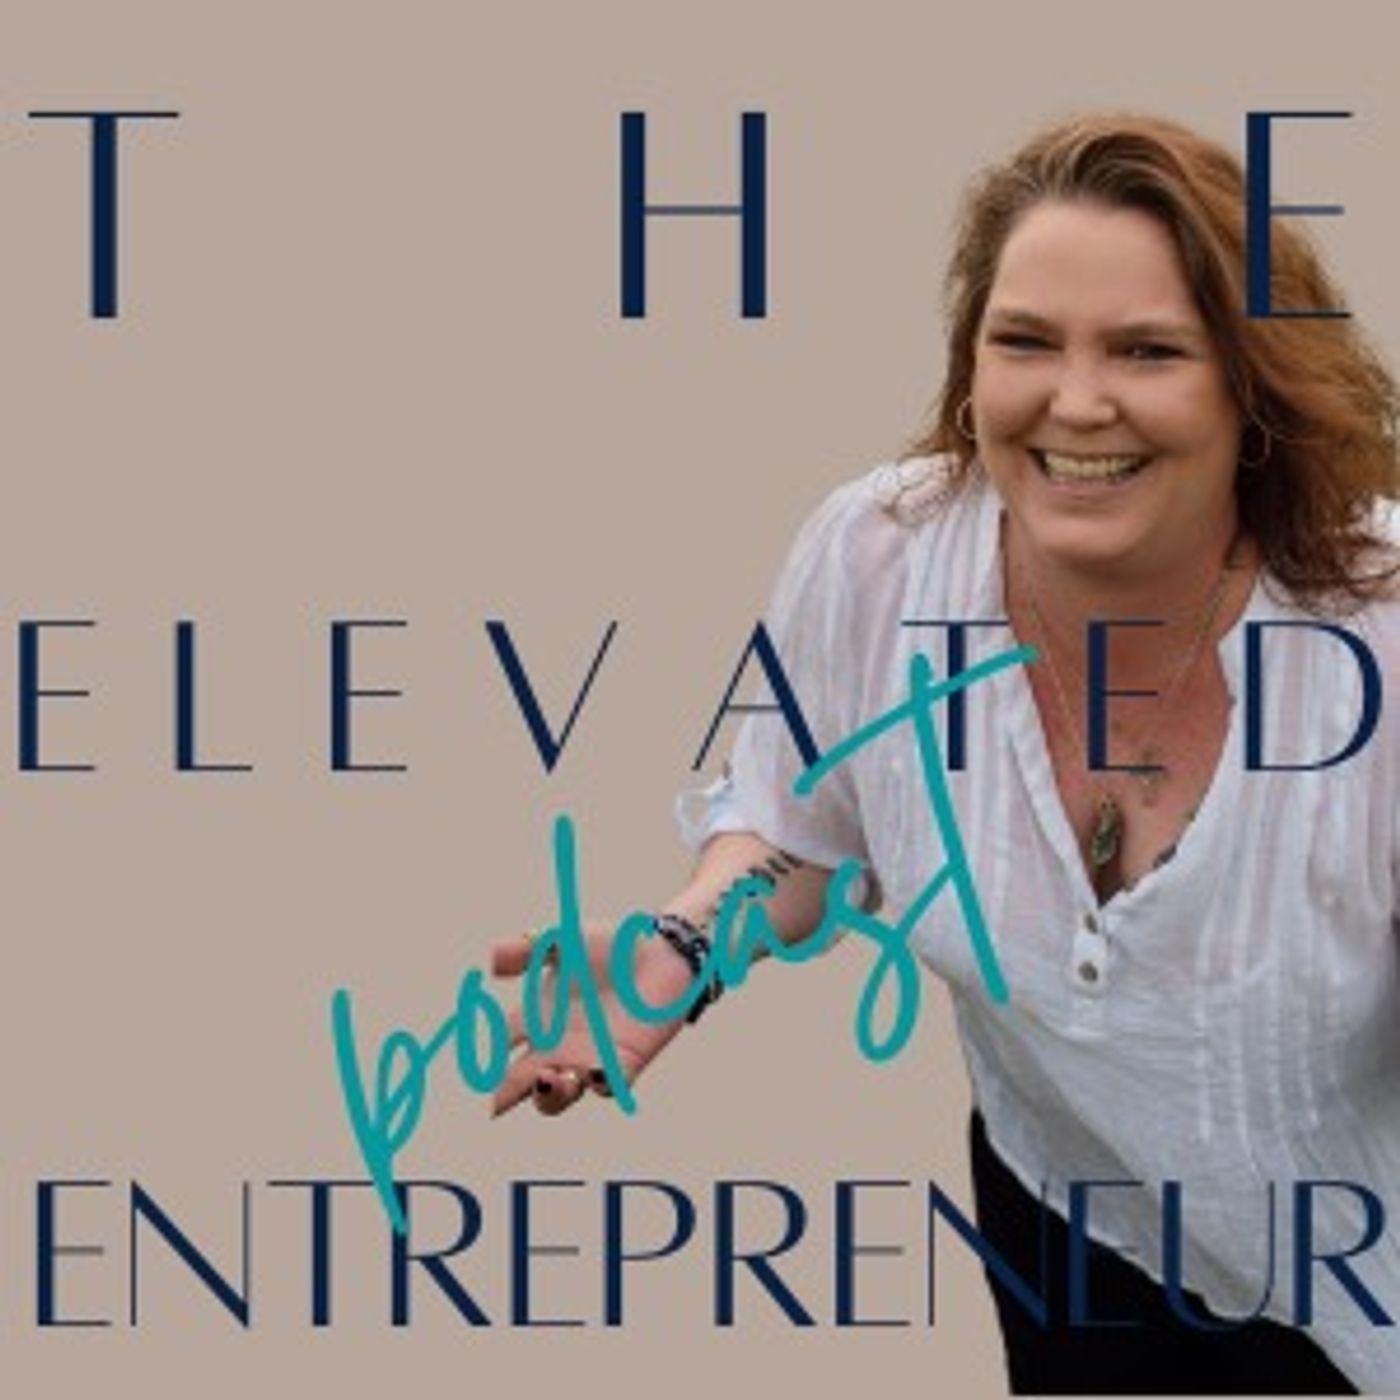 The Elevated Entrepreneur